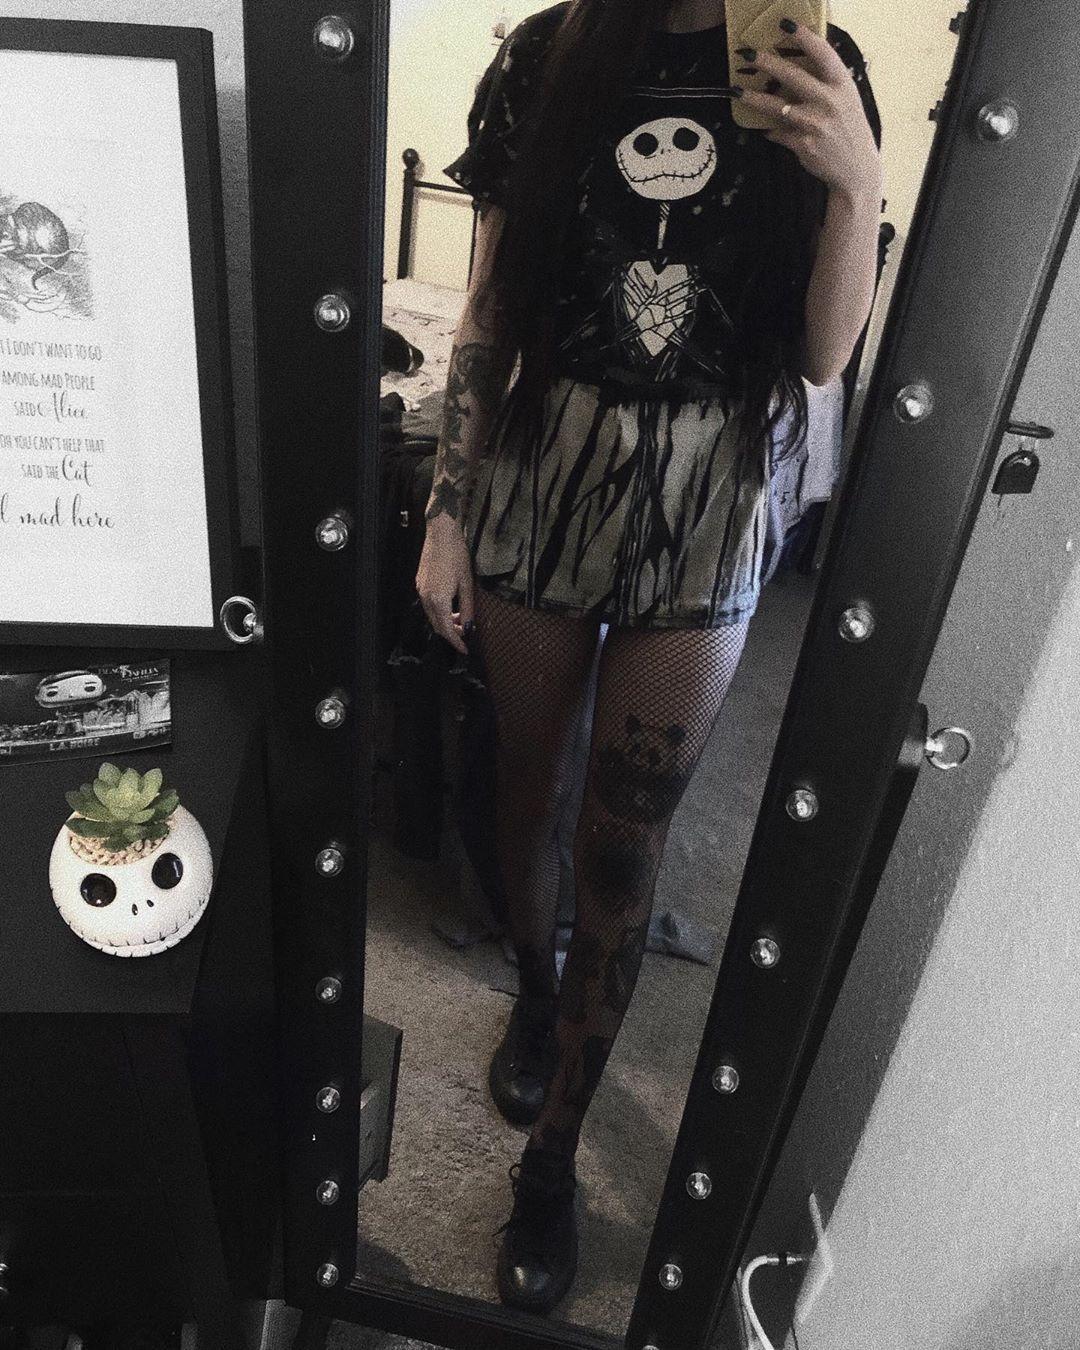 ☠️ #ootd #outfitinspiration #oversizedshirt #oversized #shirtdress #nbc #nightmarebeforechristmas #nightmarebeforechristmasshirt #jackskellington #jackskellingtonsucculent #jackskellingtonshirt #htfandom #htfashion #inked #inkedgirls #inkedlegs #inkedarm #girlswithtattoos #tattoedgirl #tattooedgirls #tattoos_of_instagram #nerdygirl #nerdheaven #longhair #darkhair #darkvibes